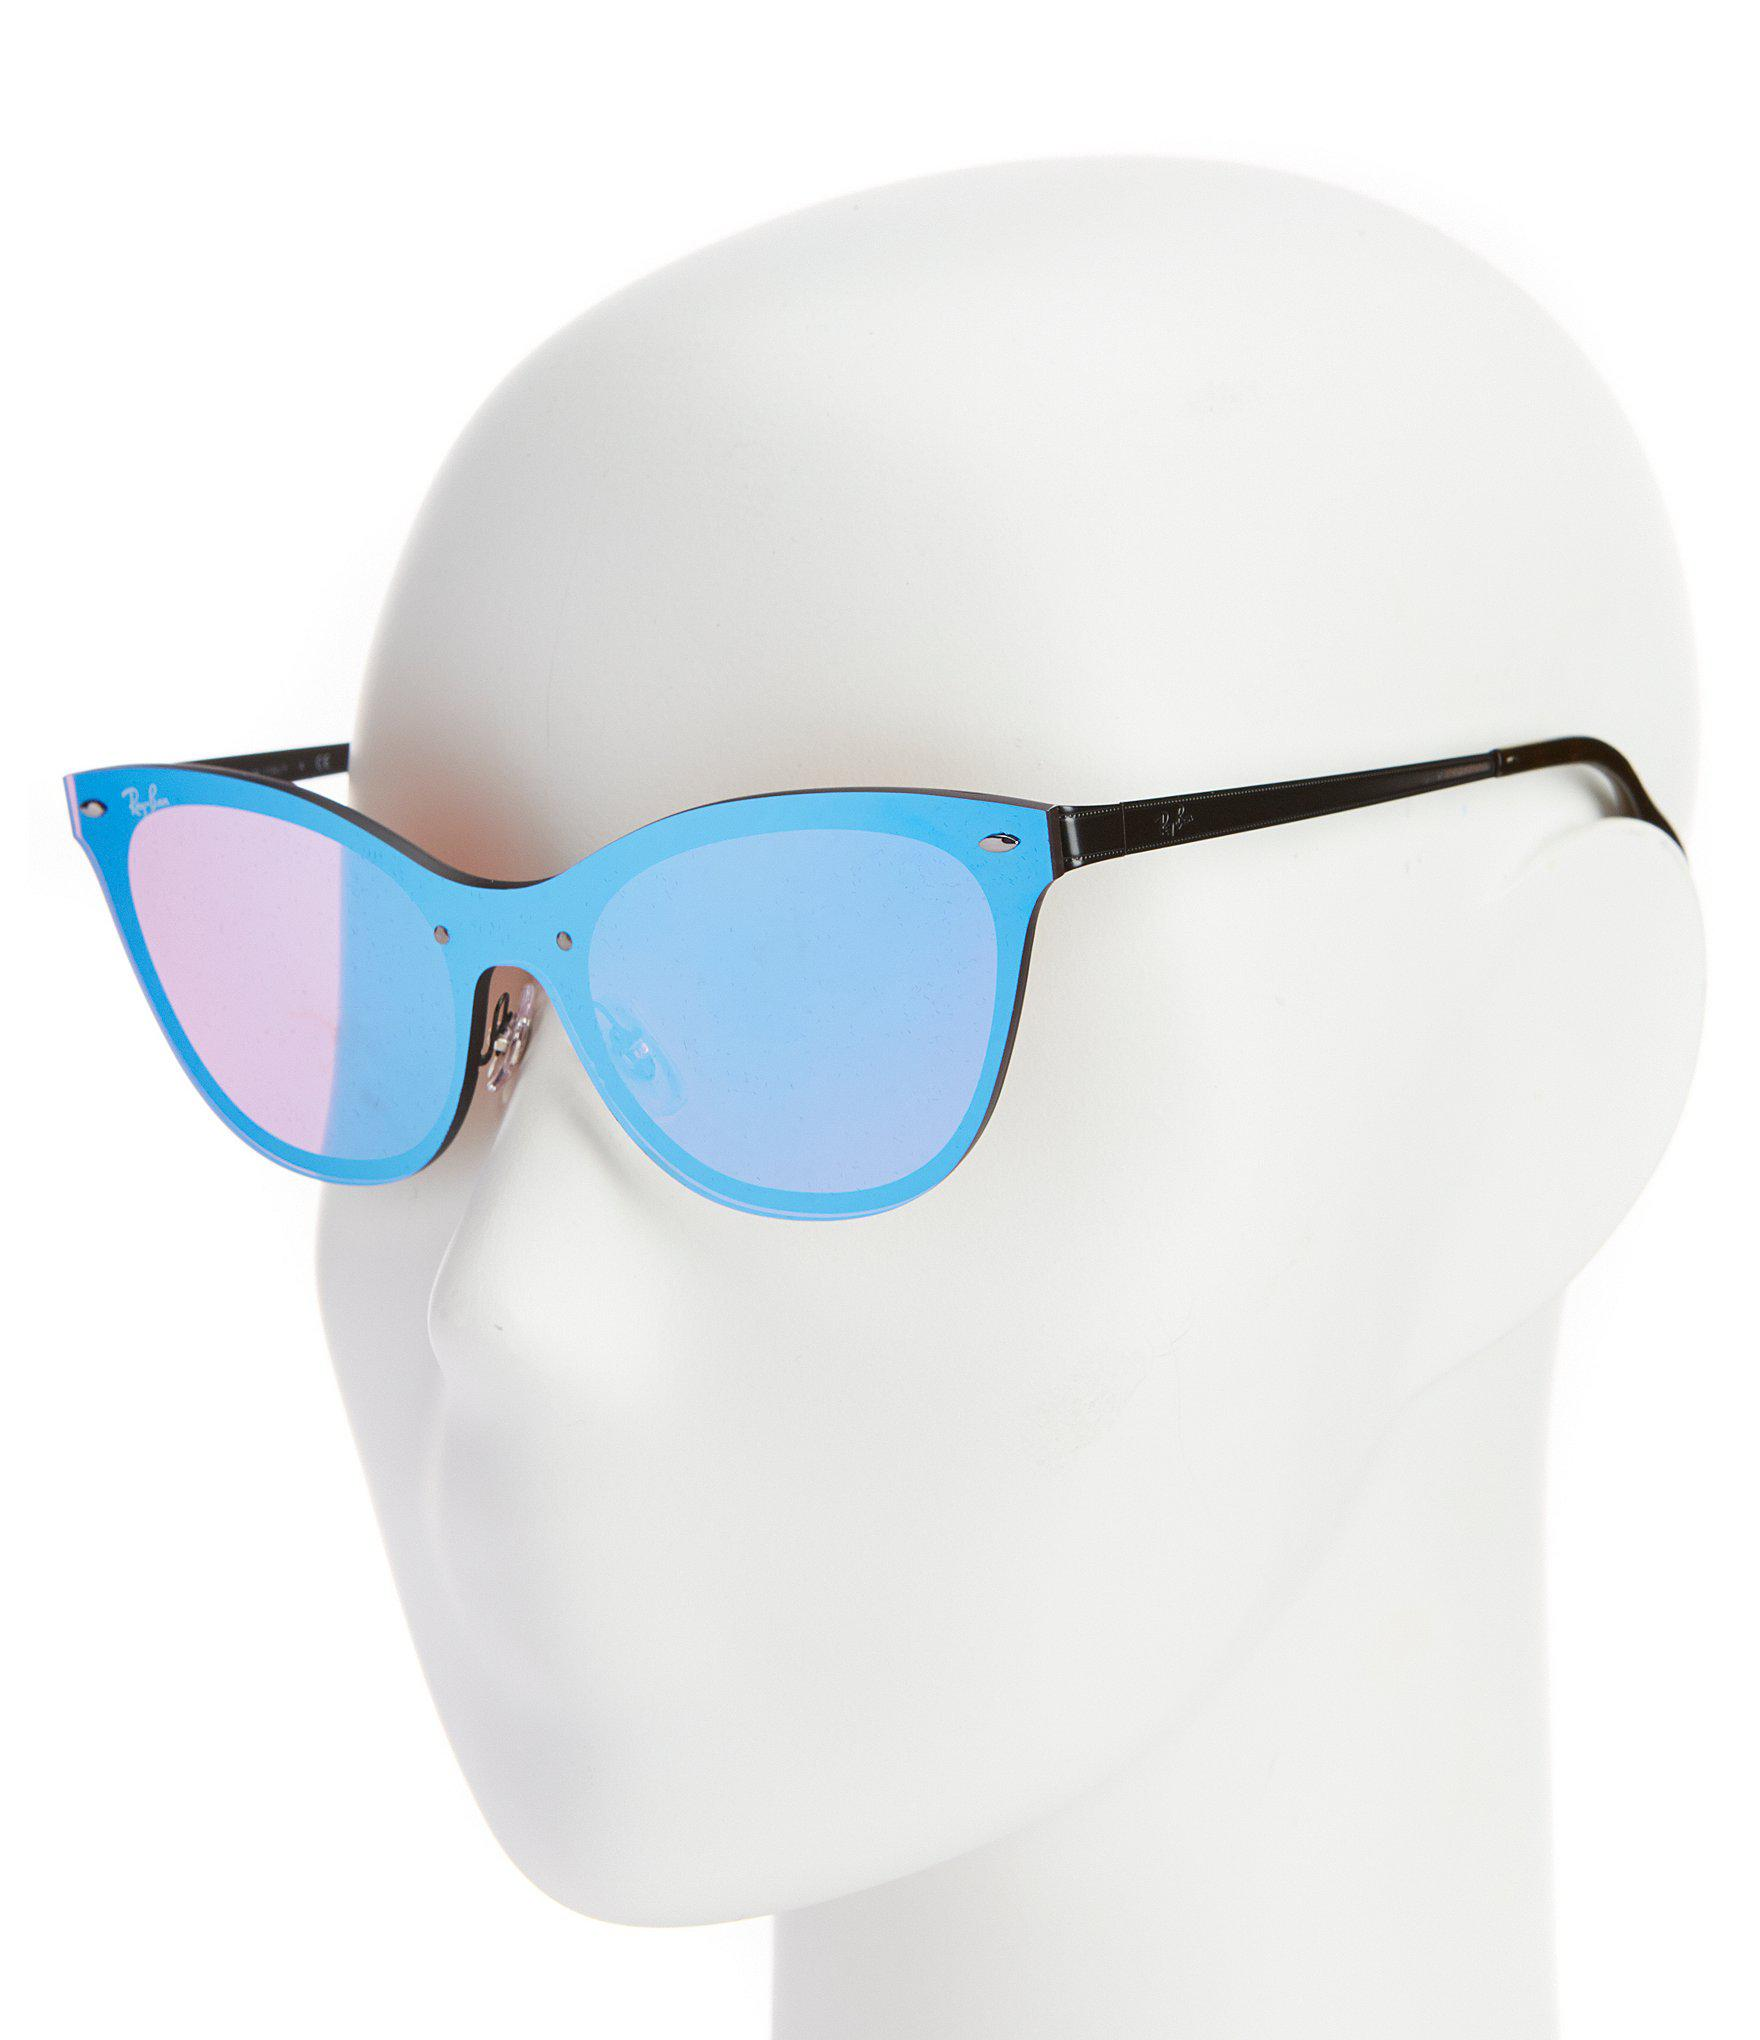 c46dbb49e8 ... cheap ray ban blue blaze collection cateye rimless mirrored lens  sunglasses lyst. view fullscreen 02dd3